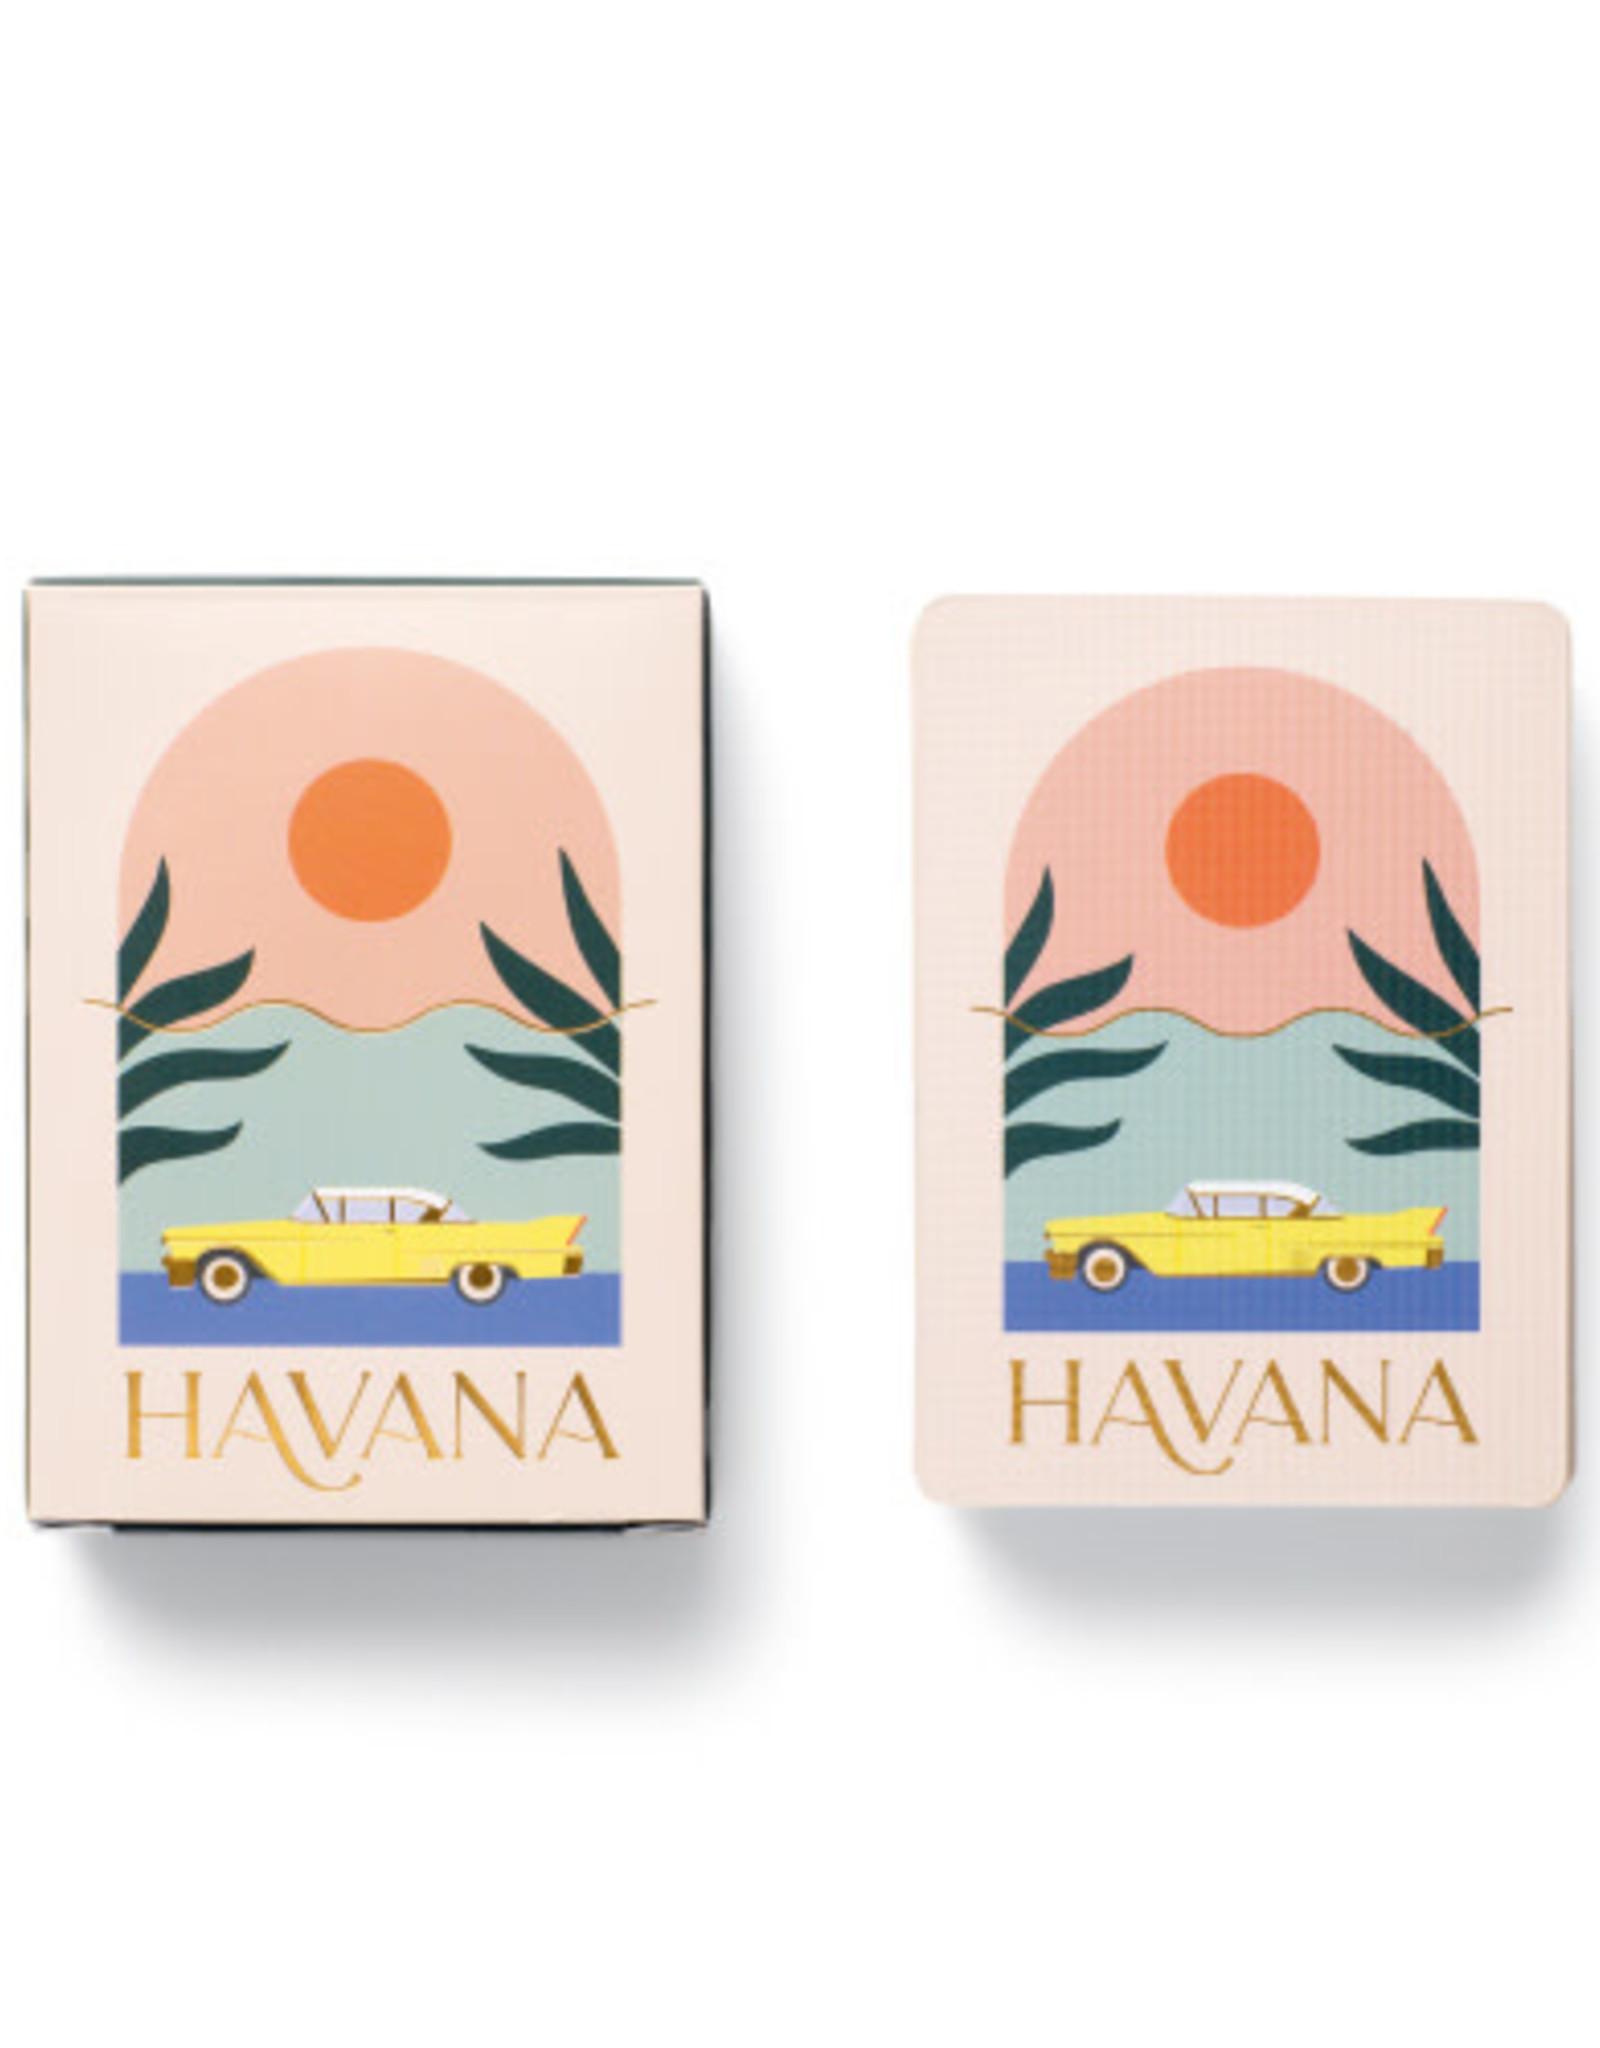 Designworks Ink Jeu de Cartes  - Havana Pêche